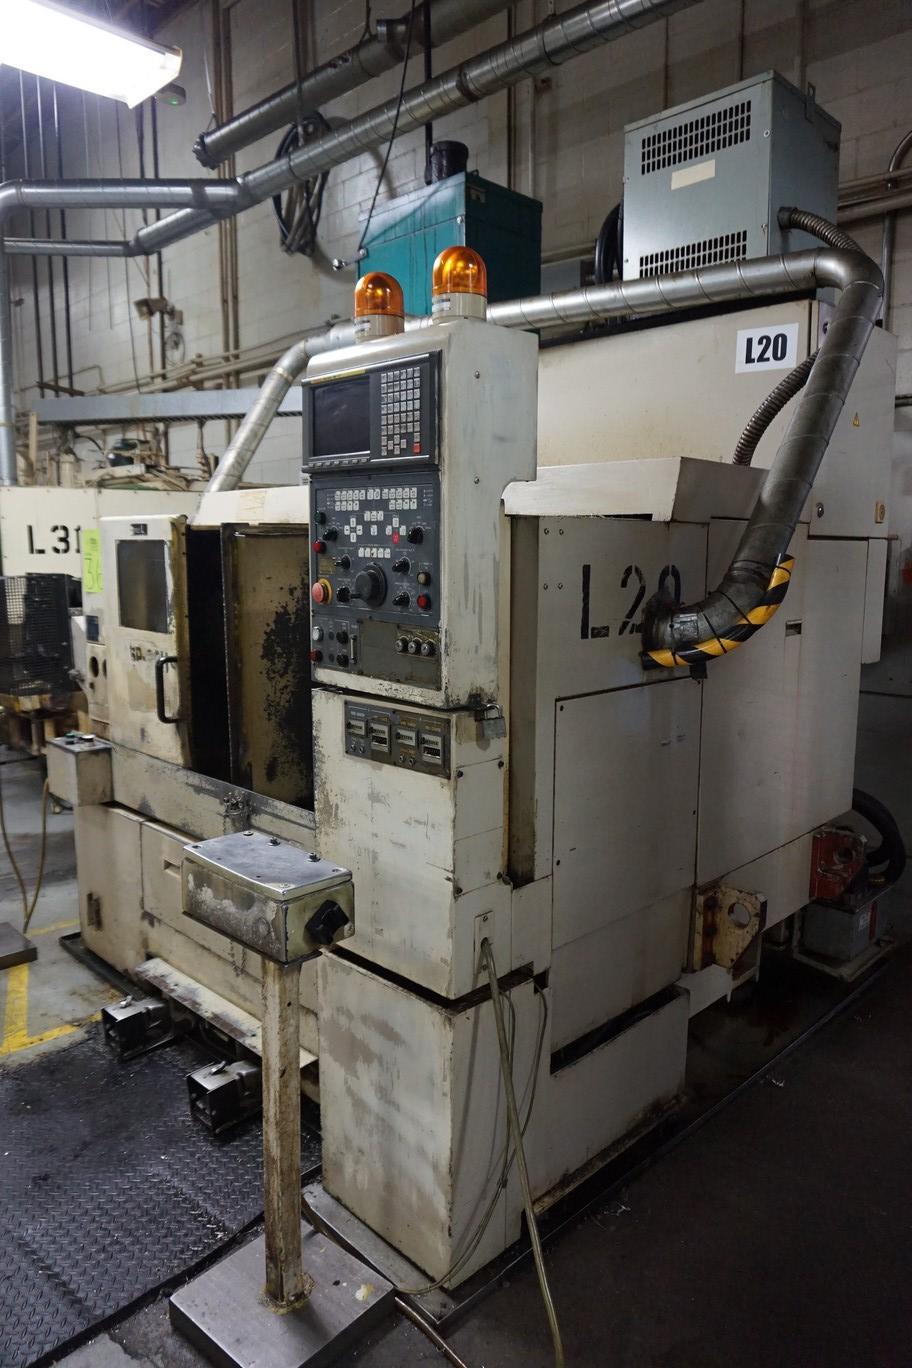 Okuma-Howa Model 2SP-20H CNC Lathe, c/w Fanuc Series 18-TT Controller, Chip Conveyor, Transformer - Image 7 of 7